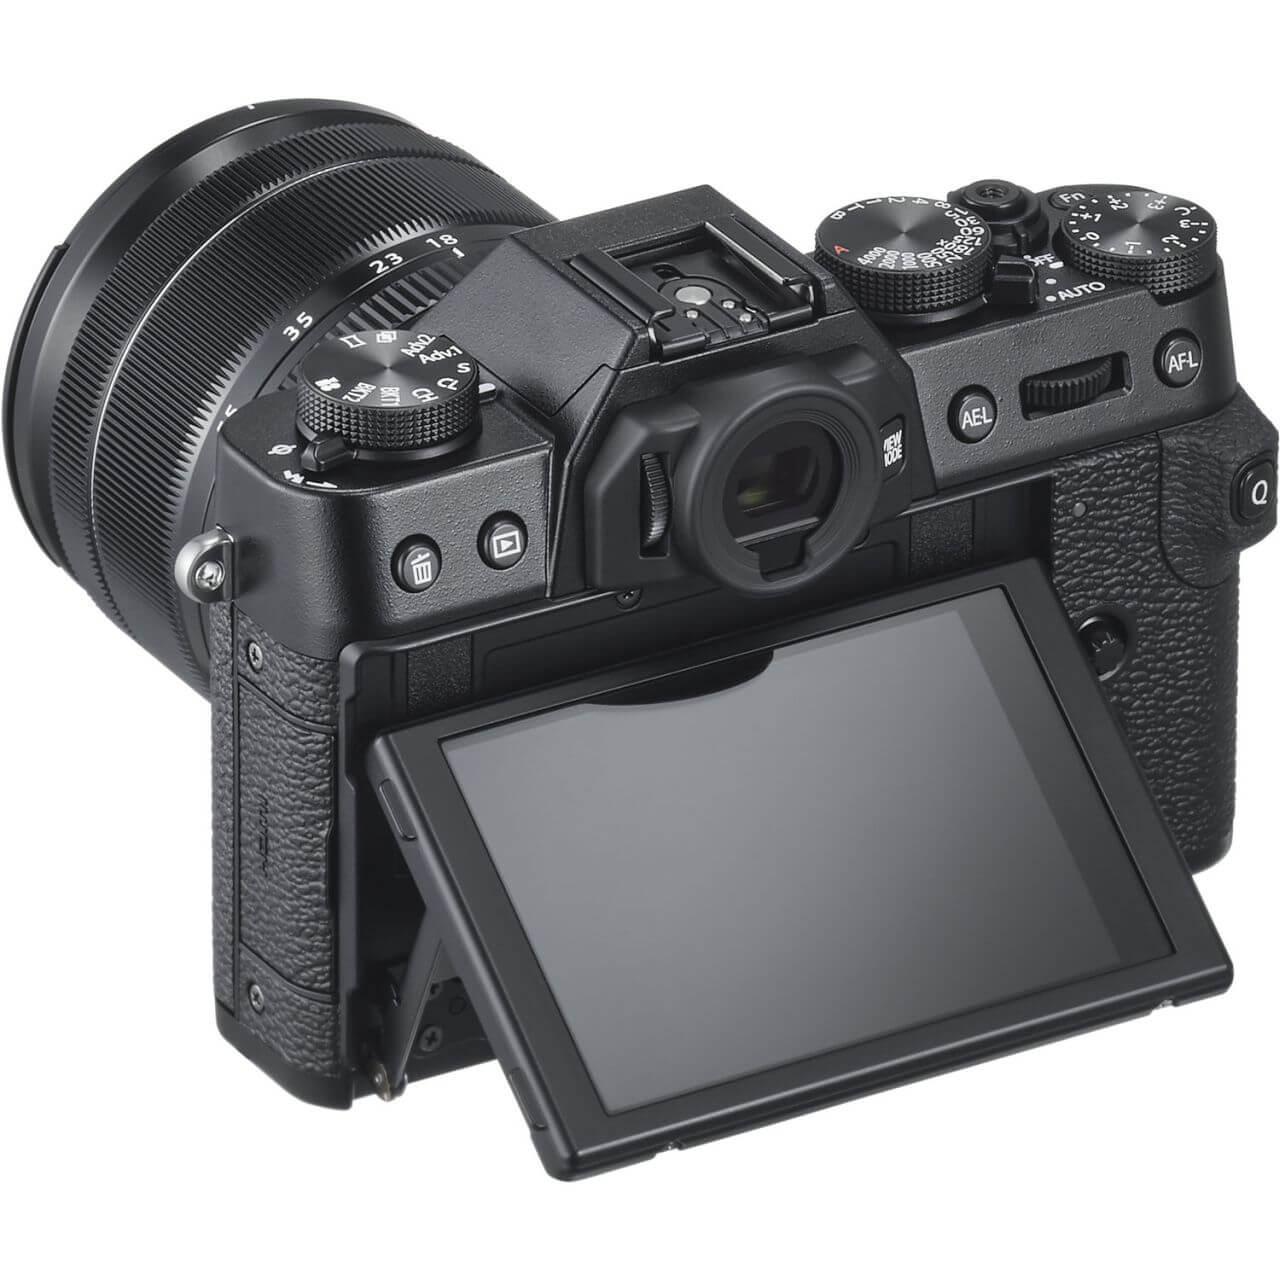 Fujifilm X-T200 vs X-T30: кому какую модель стоит выбрать